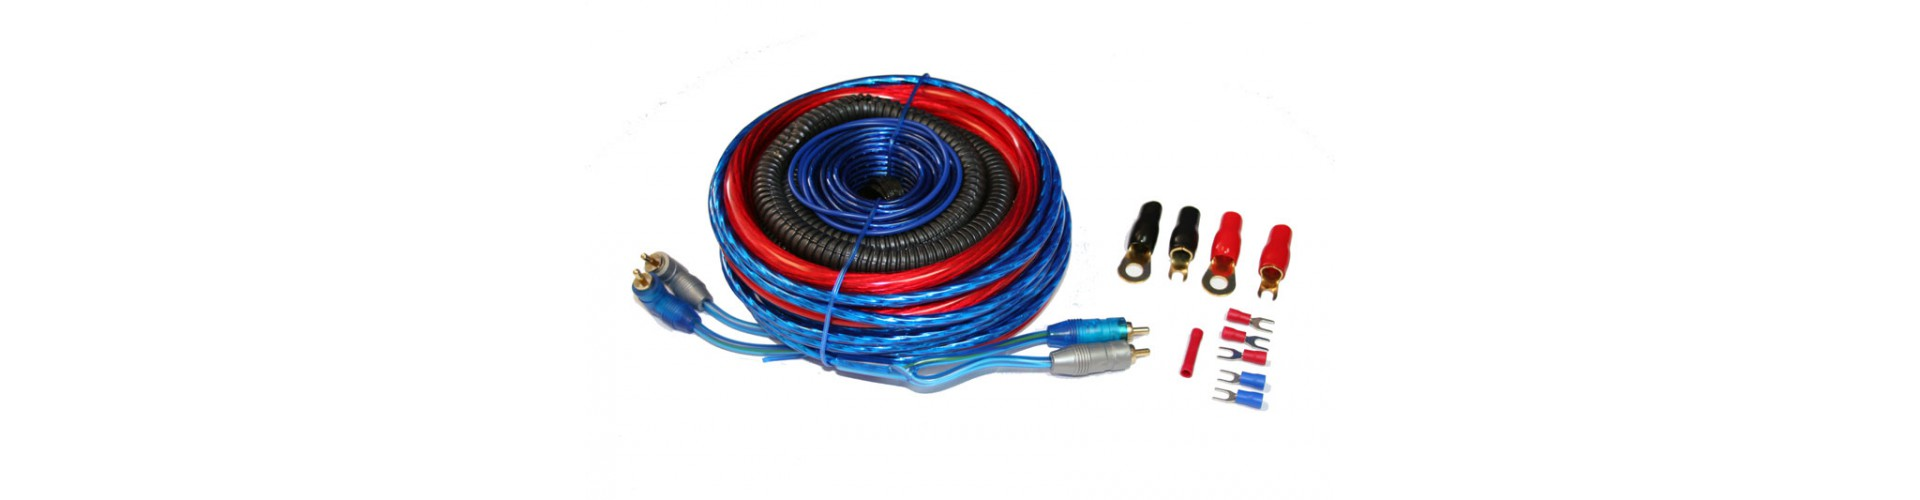 Cables | Wiring Kits | Hi-Lo Converters